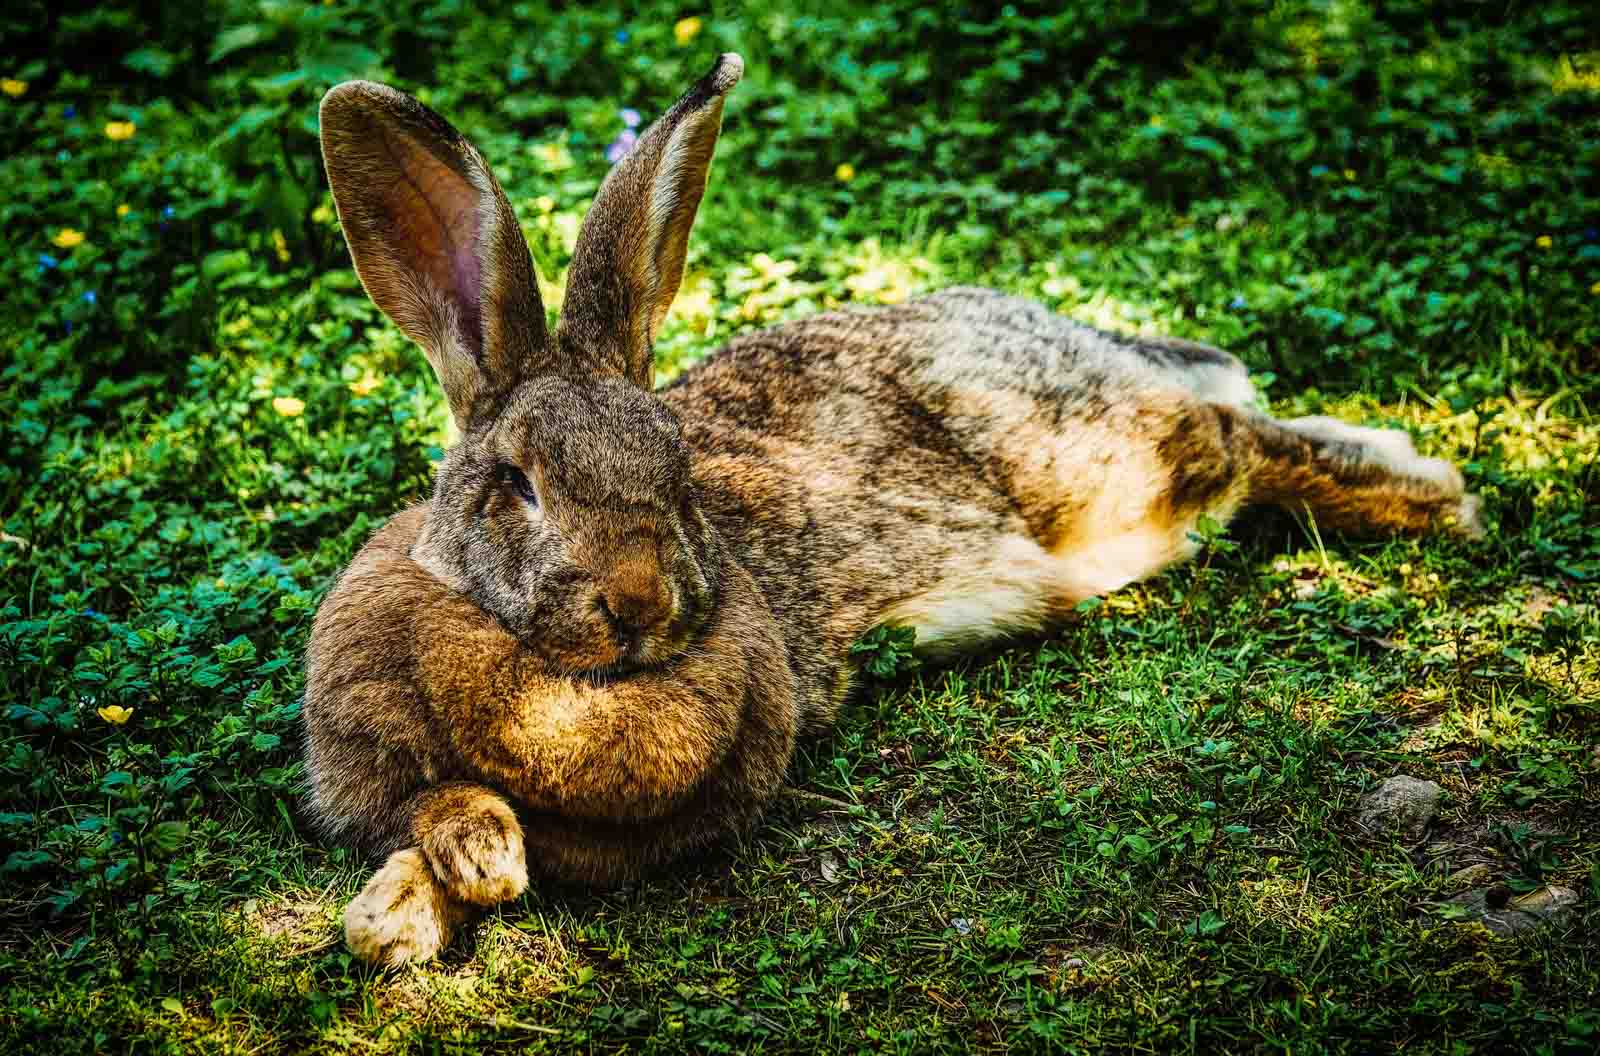 Grand lapin allongé dehors dans l'herbe